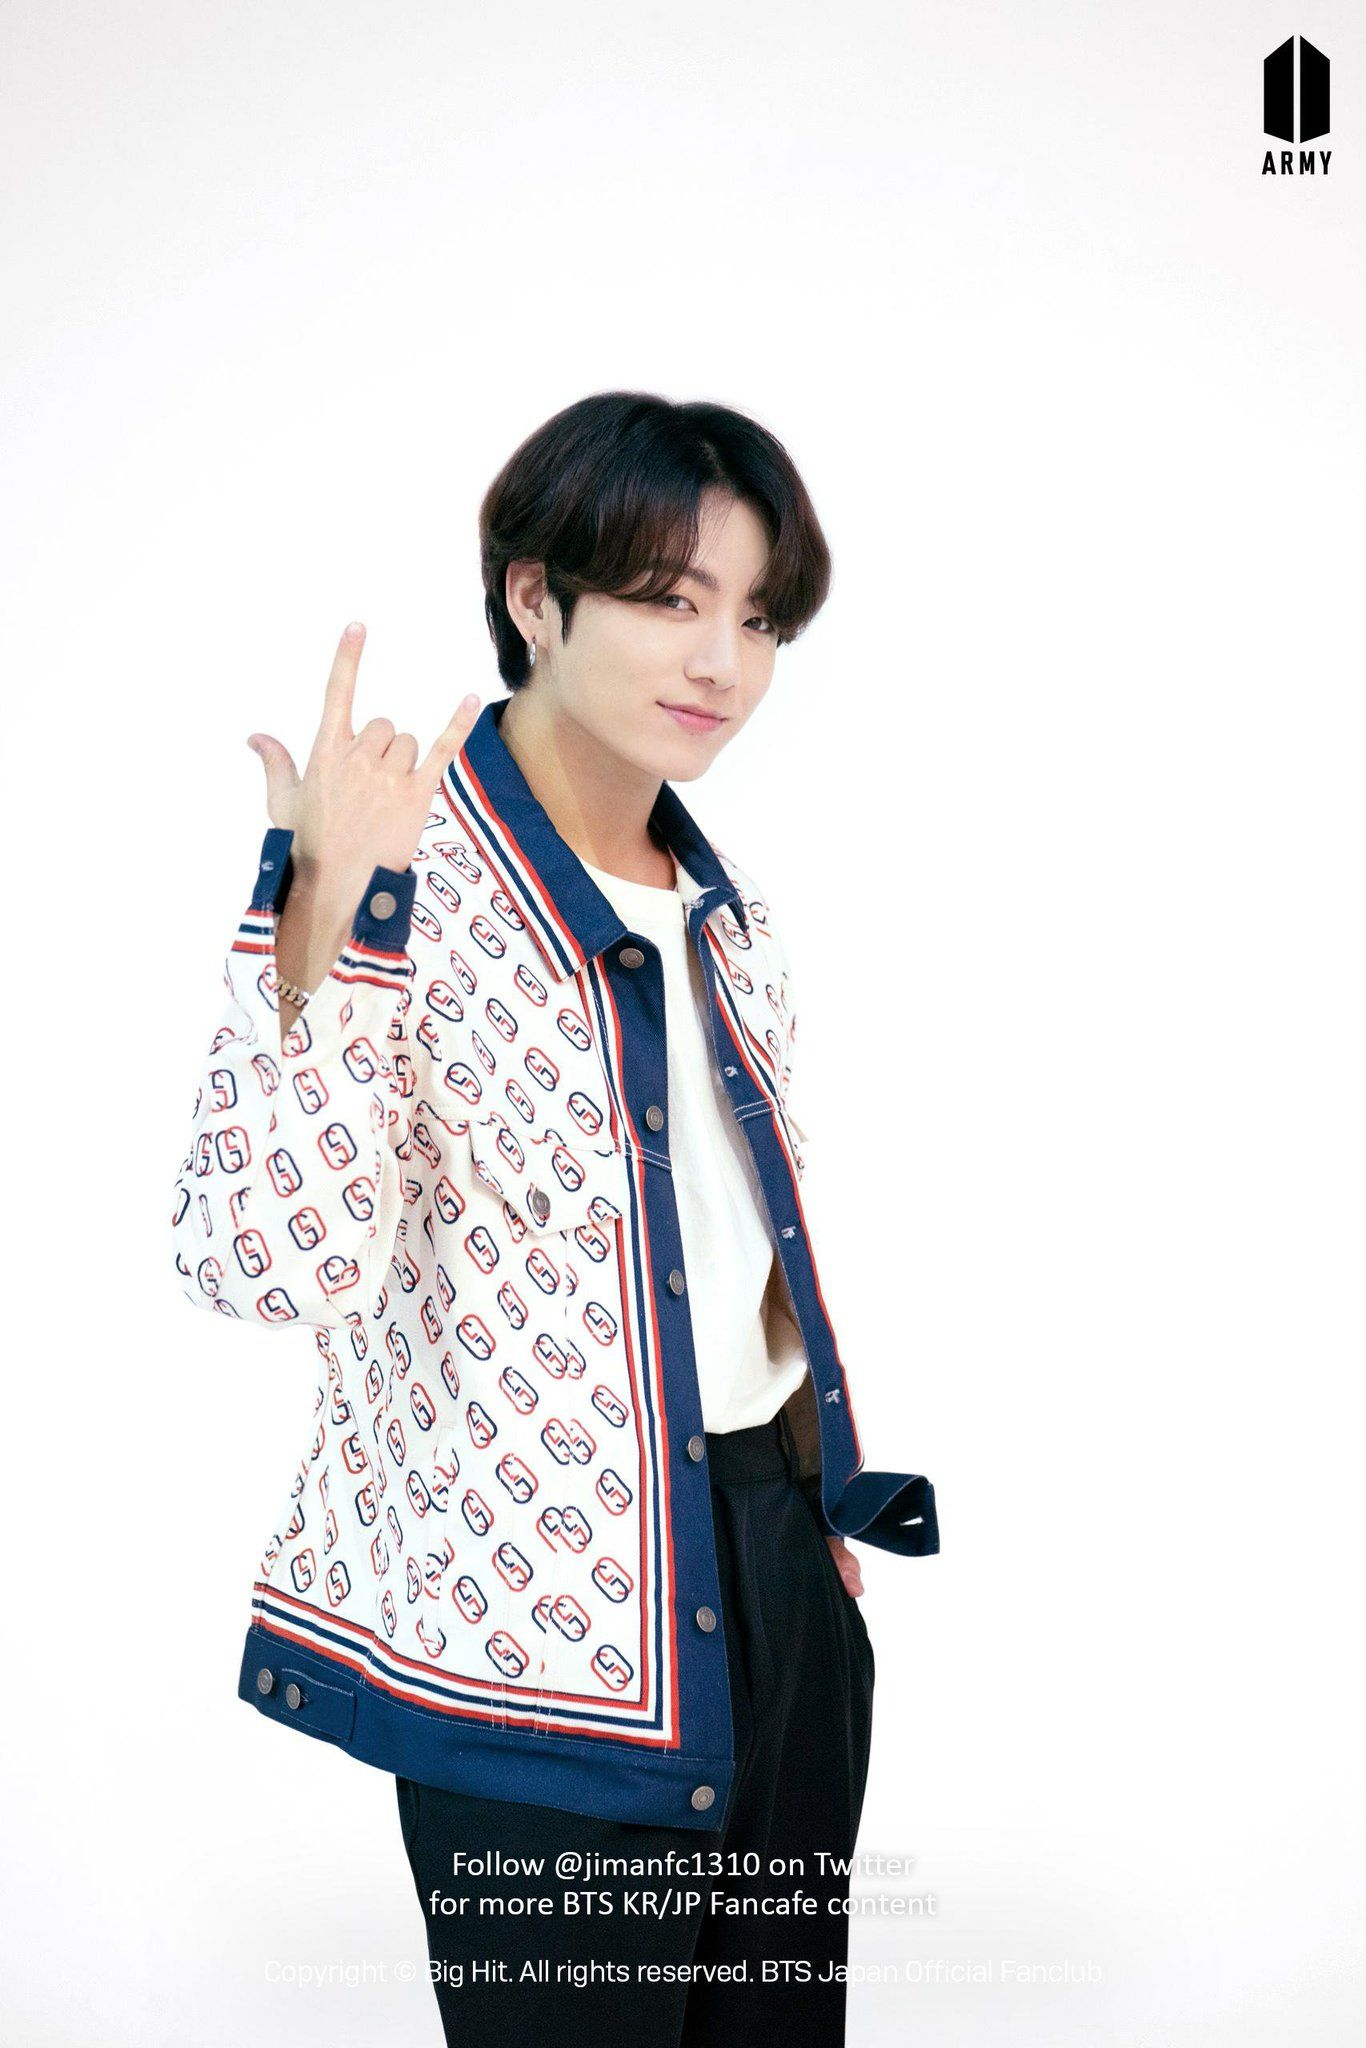 Bts Fancafe On In 2020 Bts Jungkook Bts Bangtan Boy Jungkook Oppa